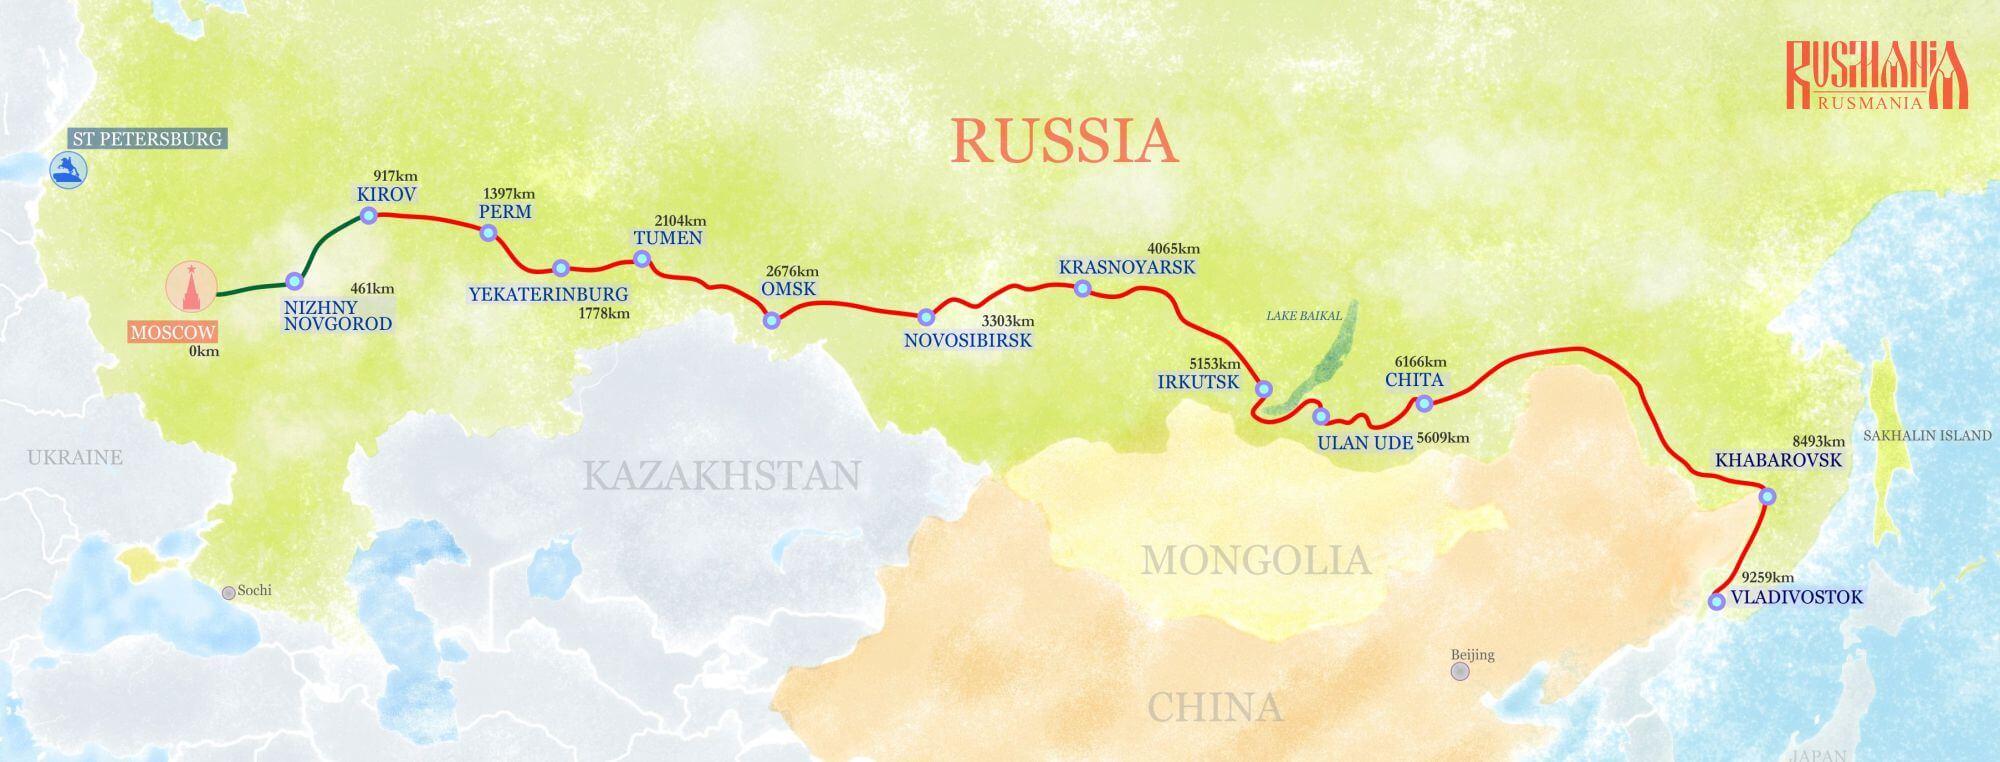 Structure Of Trans Siberian Railway Rusmania